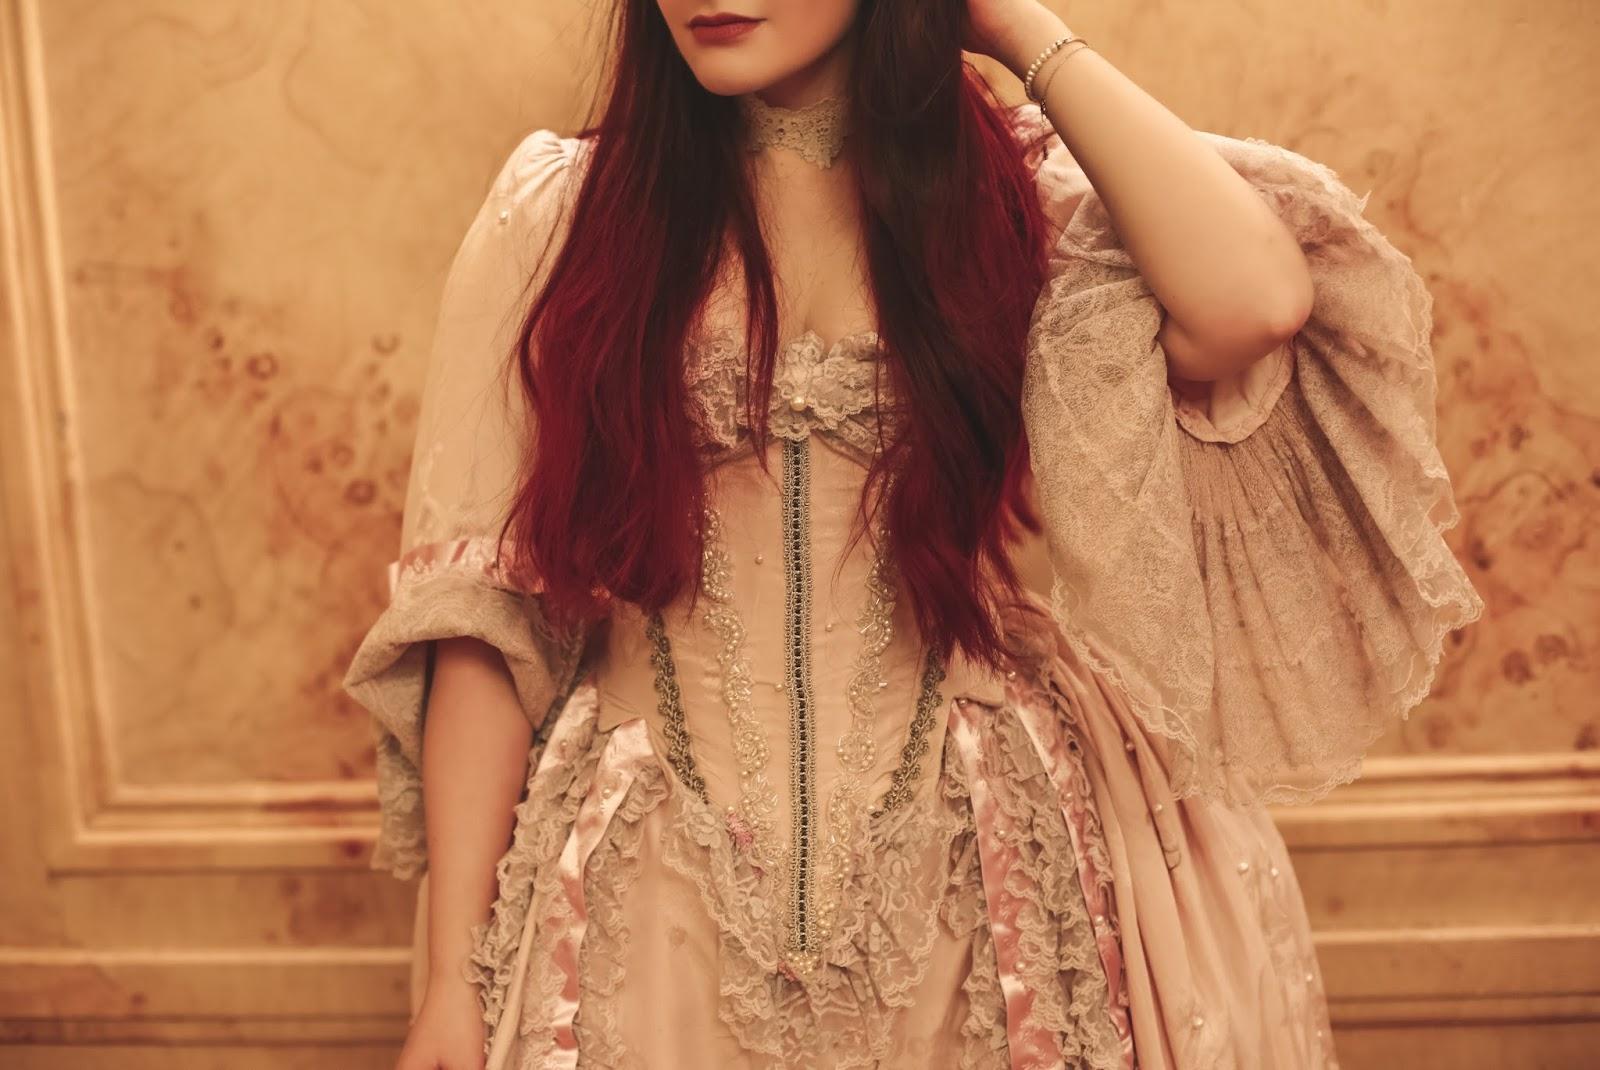 costume d'époque courtisane